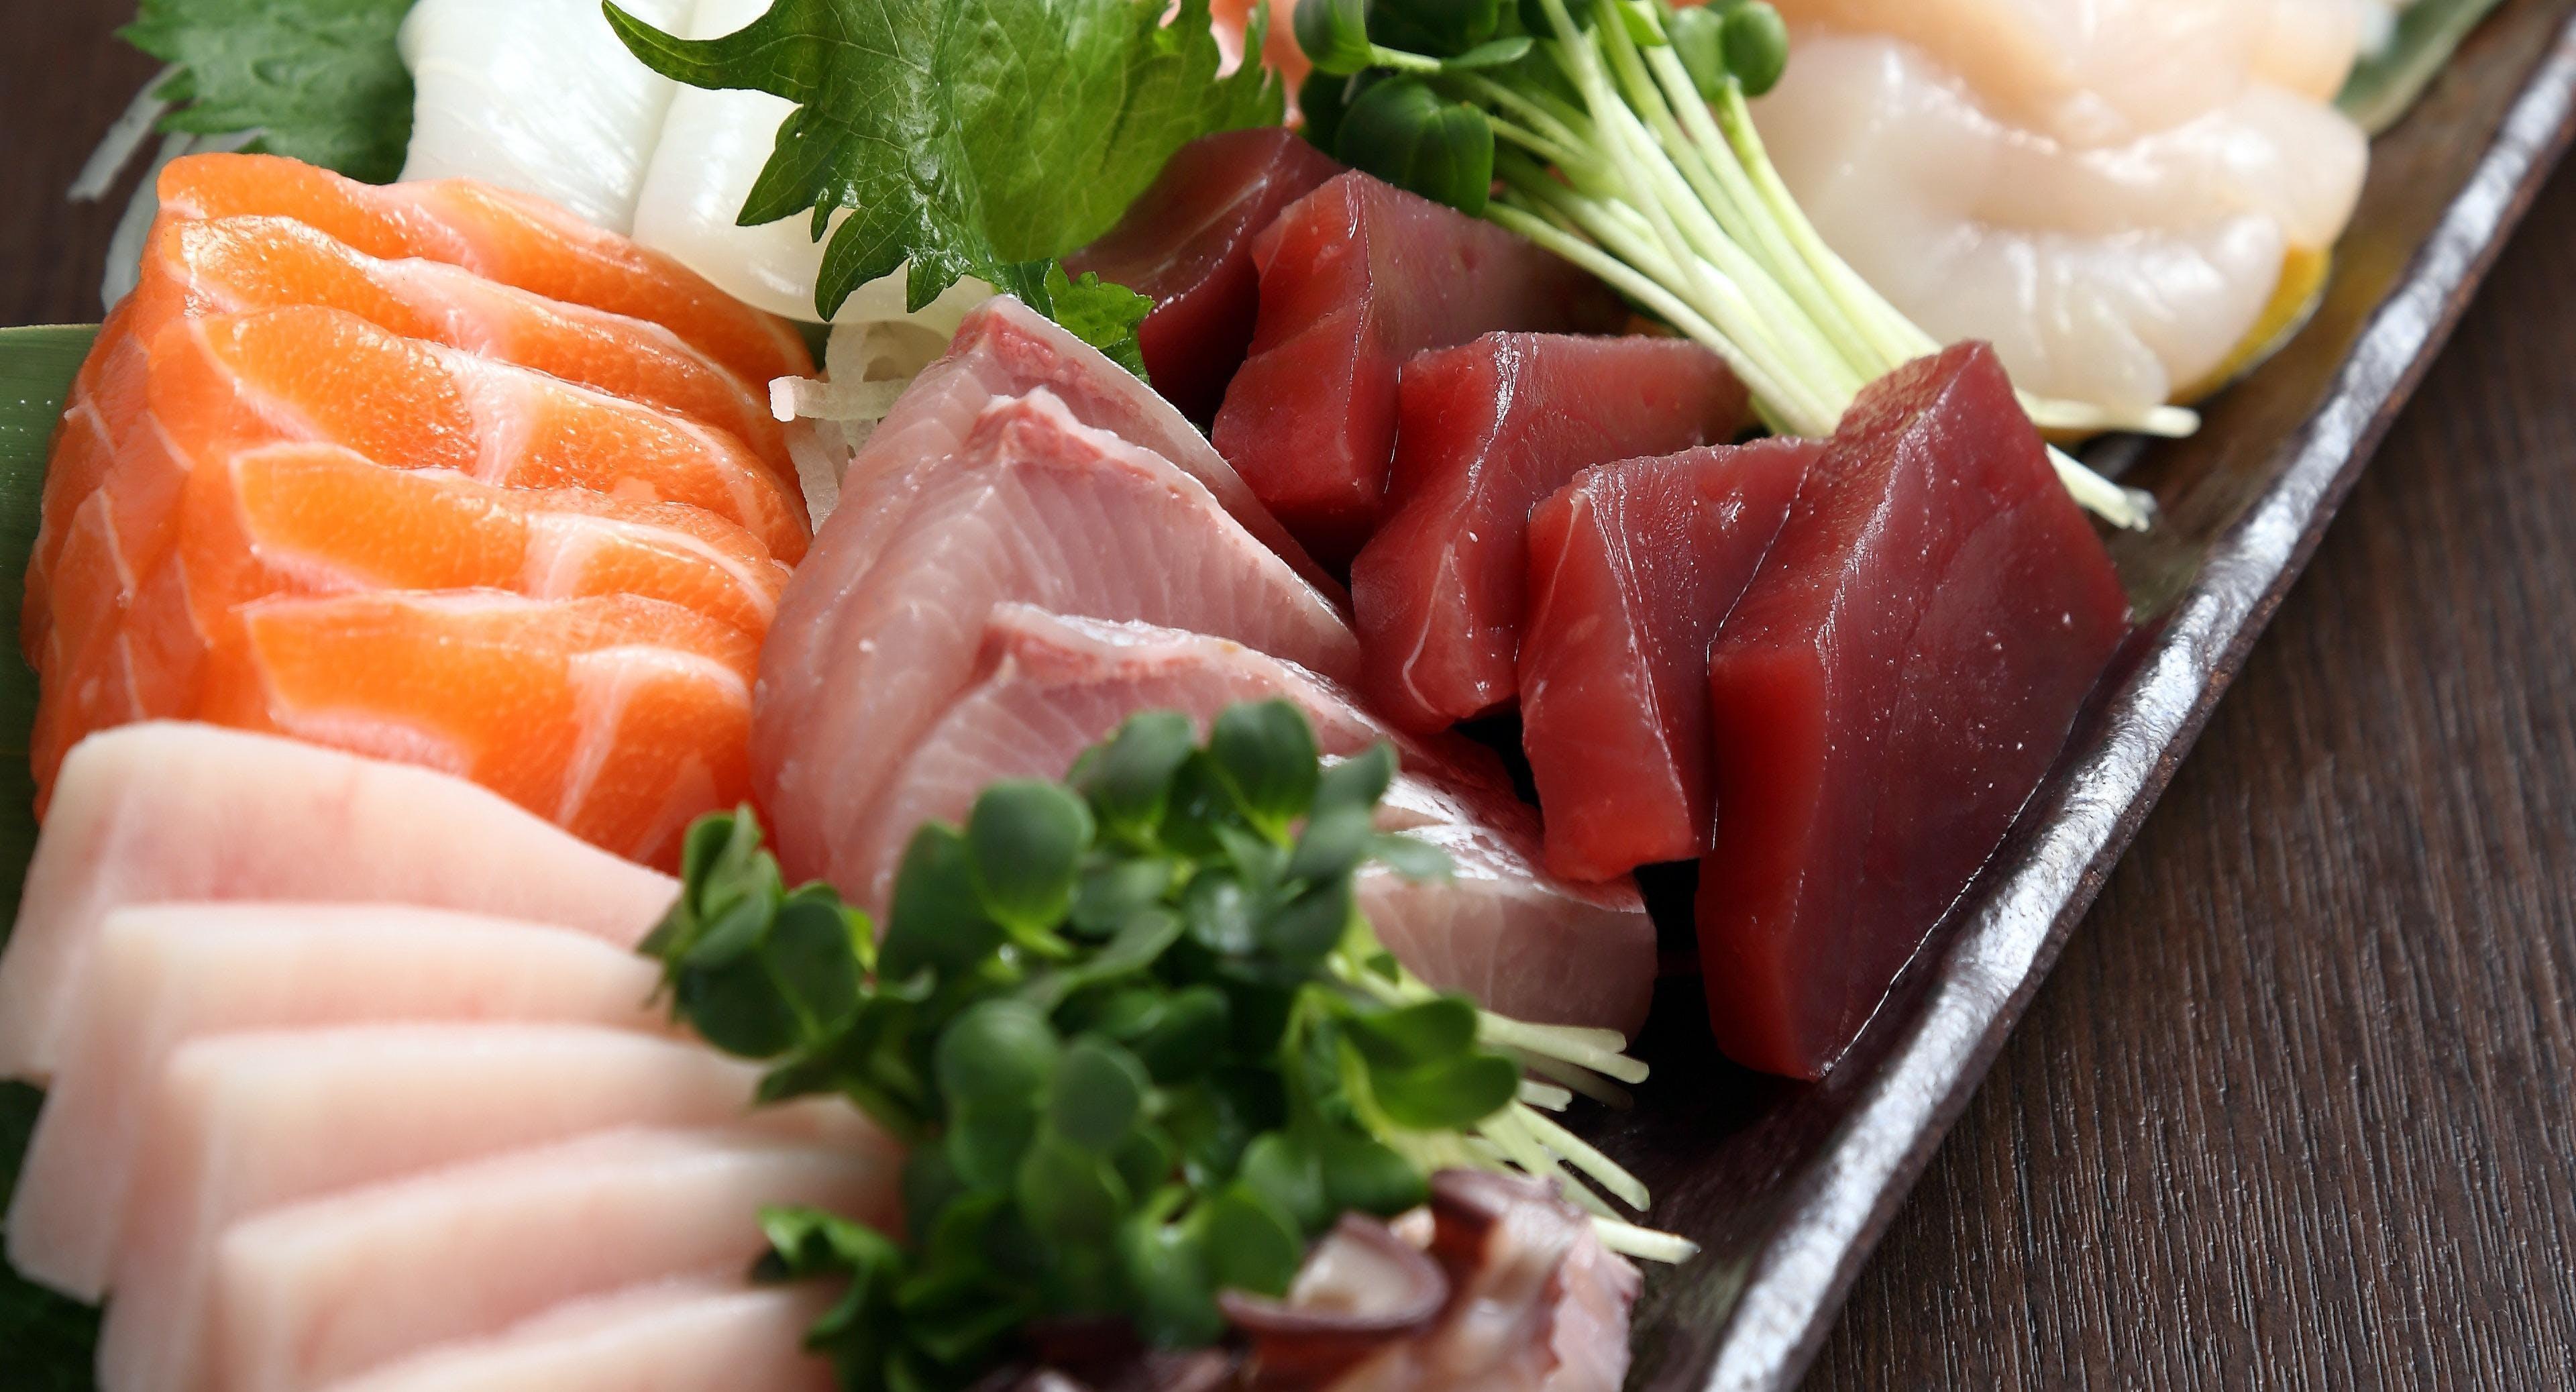 Ka Ma Do Japanese Restaurant 火間土 Hong Kong image 3